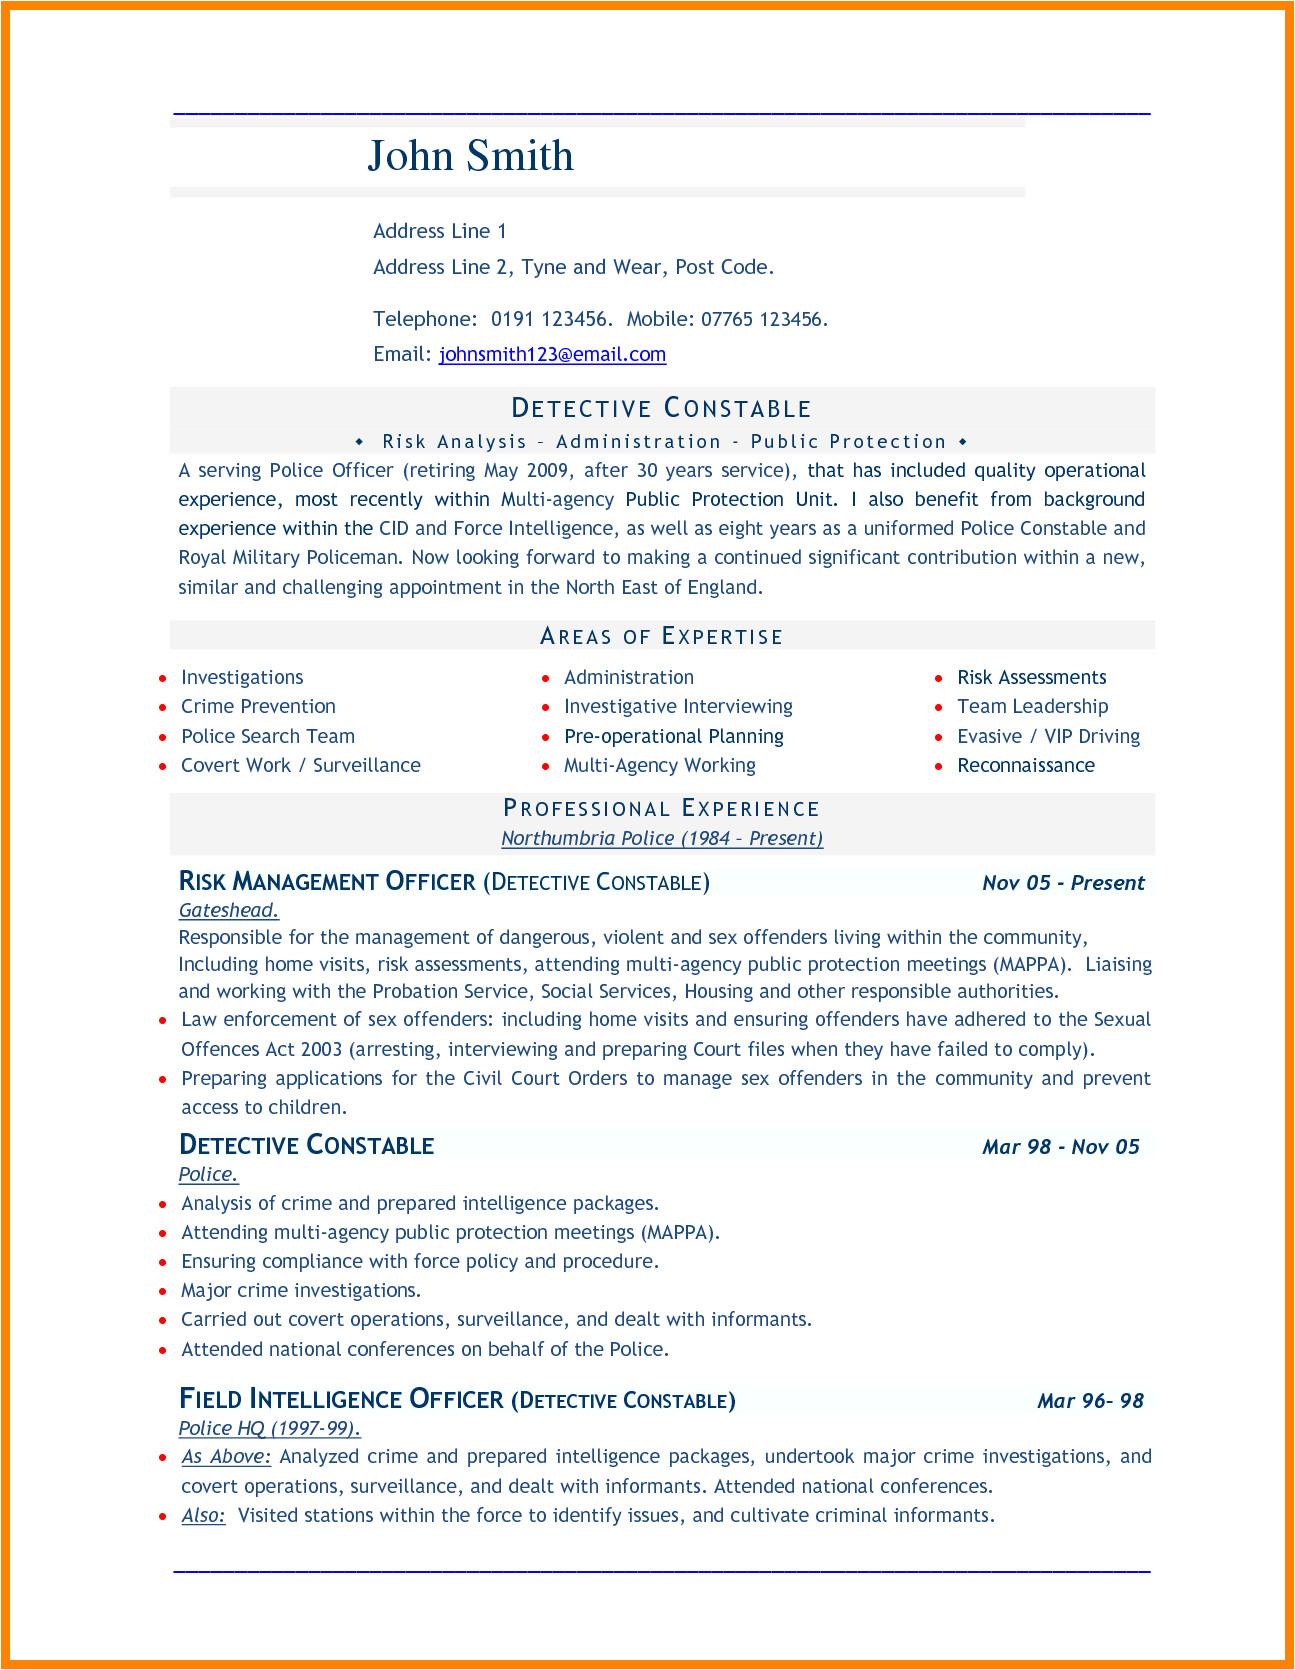 8 cv in word document